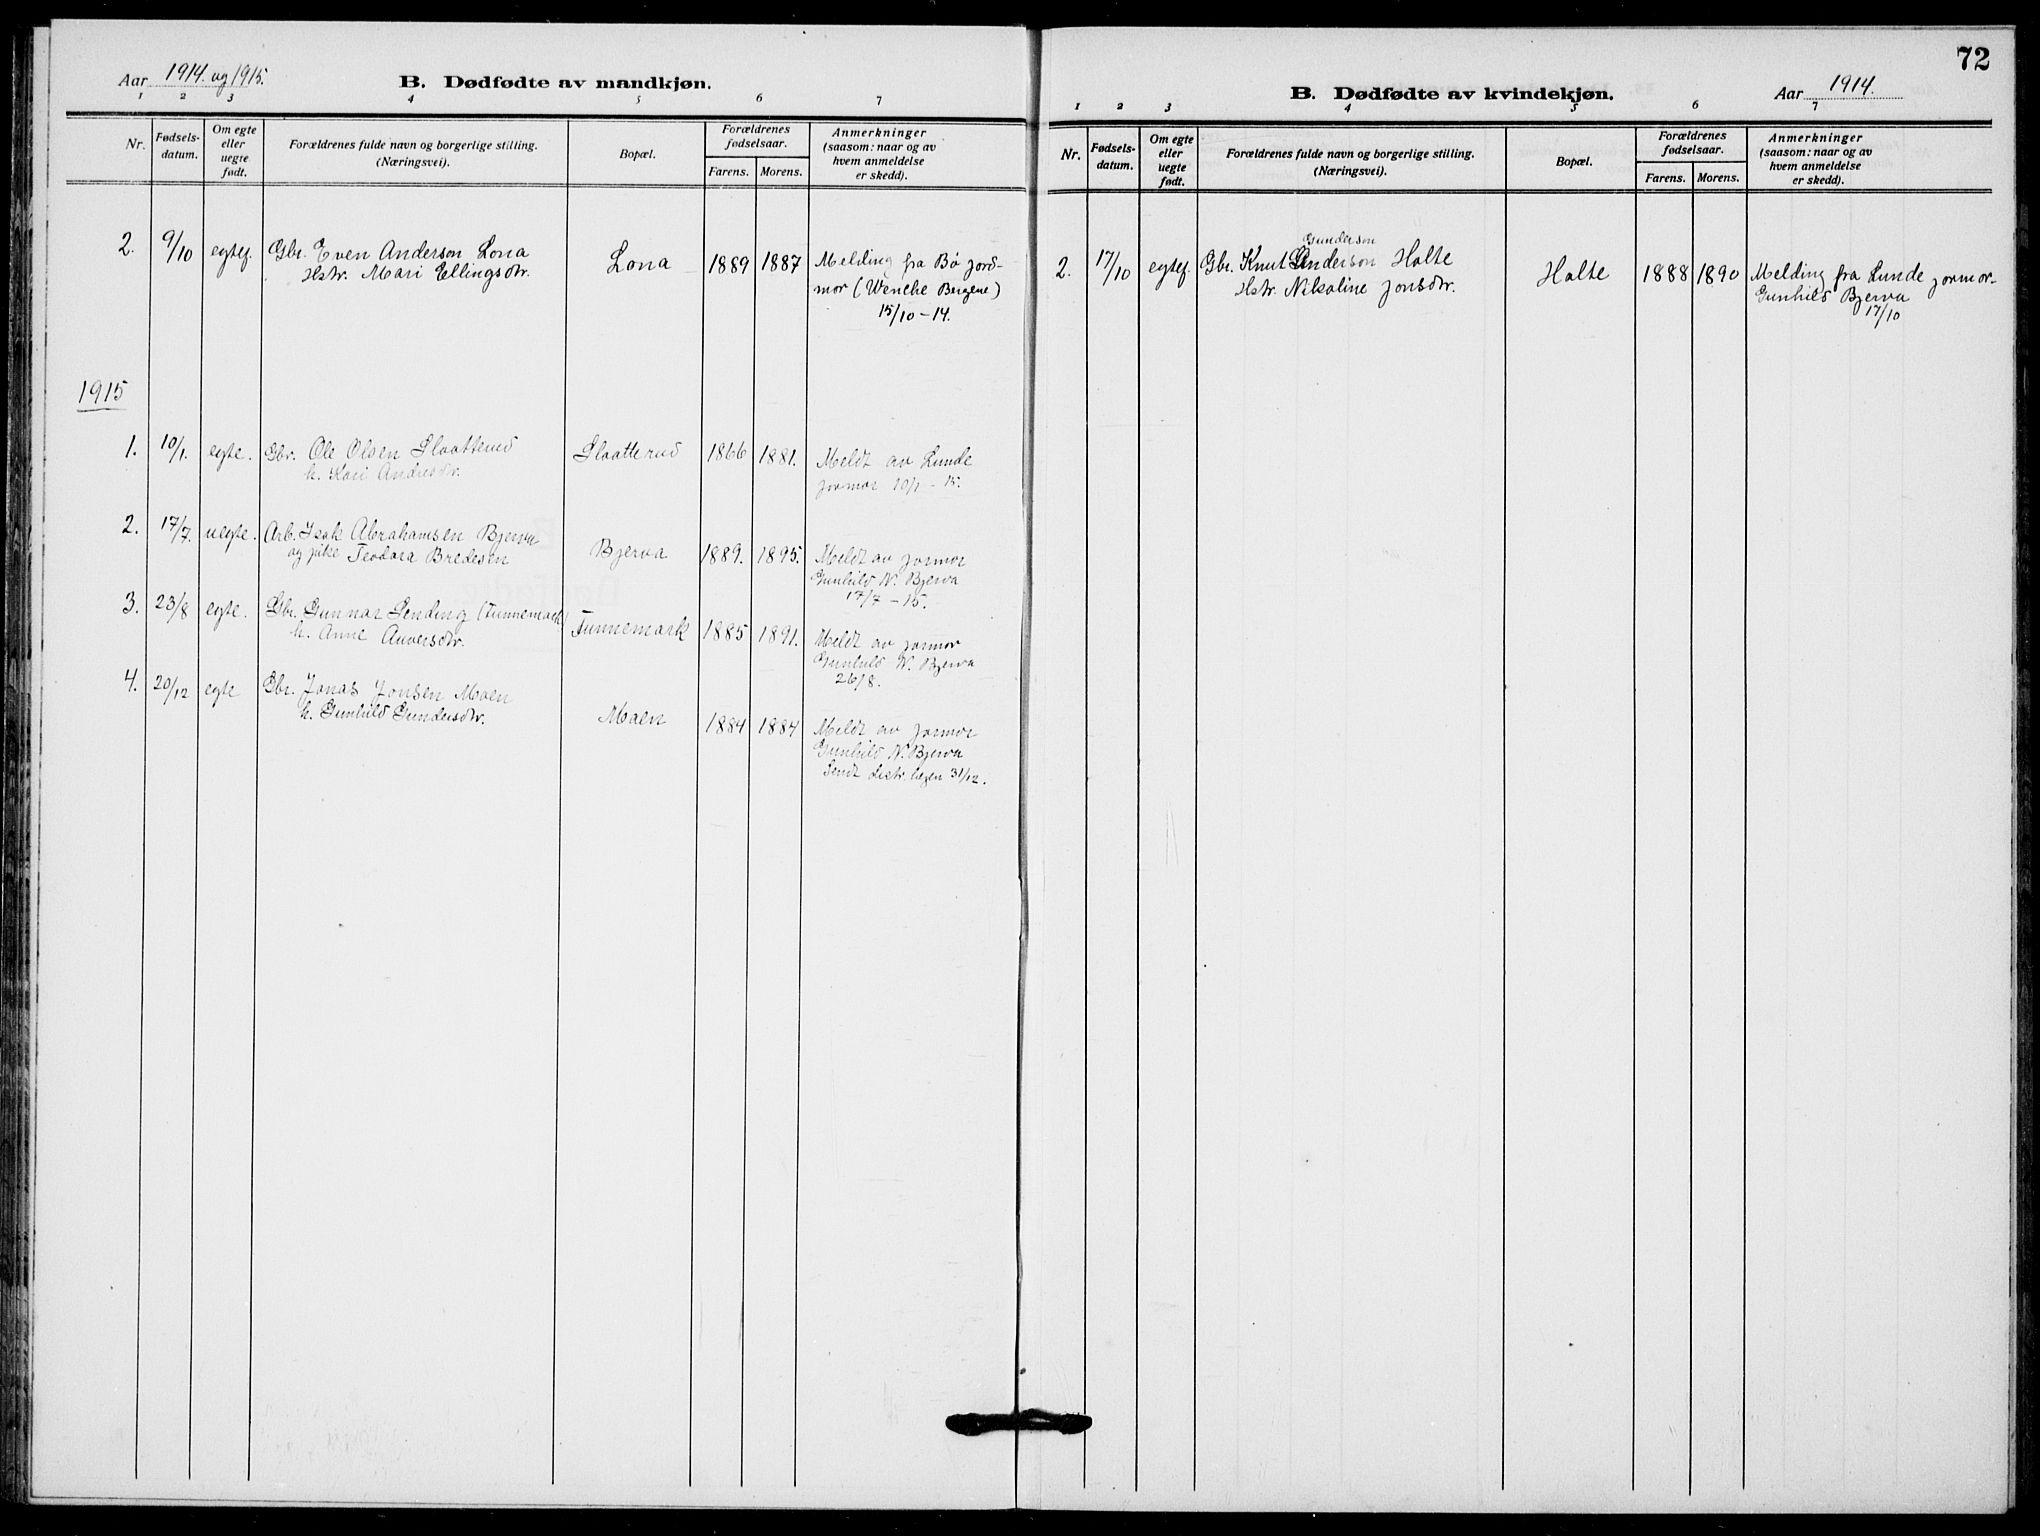 SAKO, Lunde kirkebøker, F/Fa/L0005: Ministerialbok nr. I 5, 1914-1922, s. 72